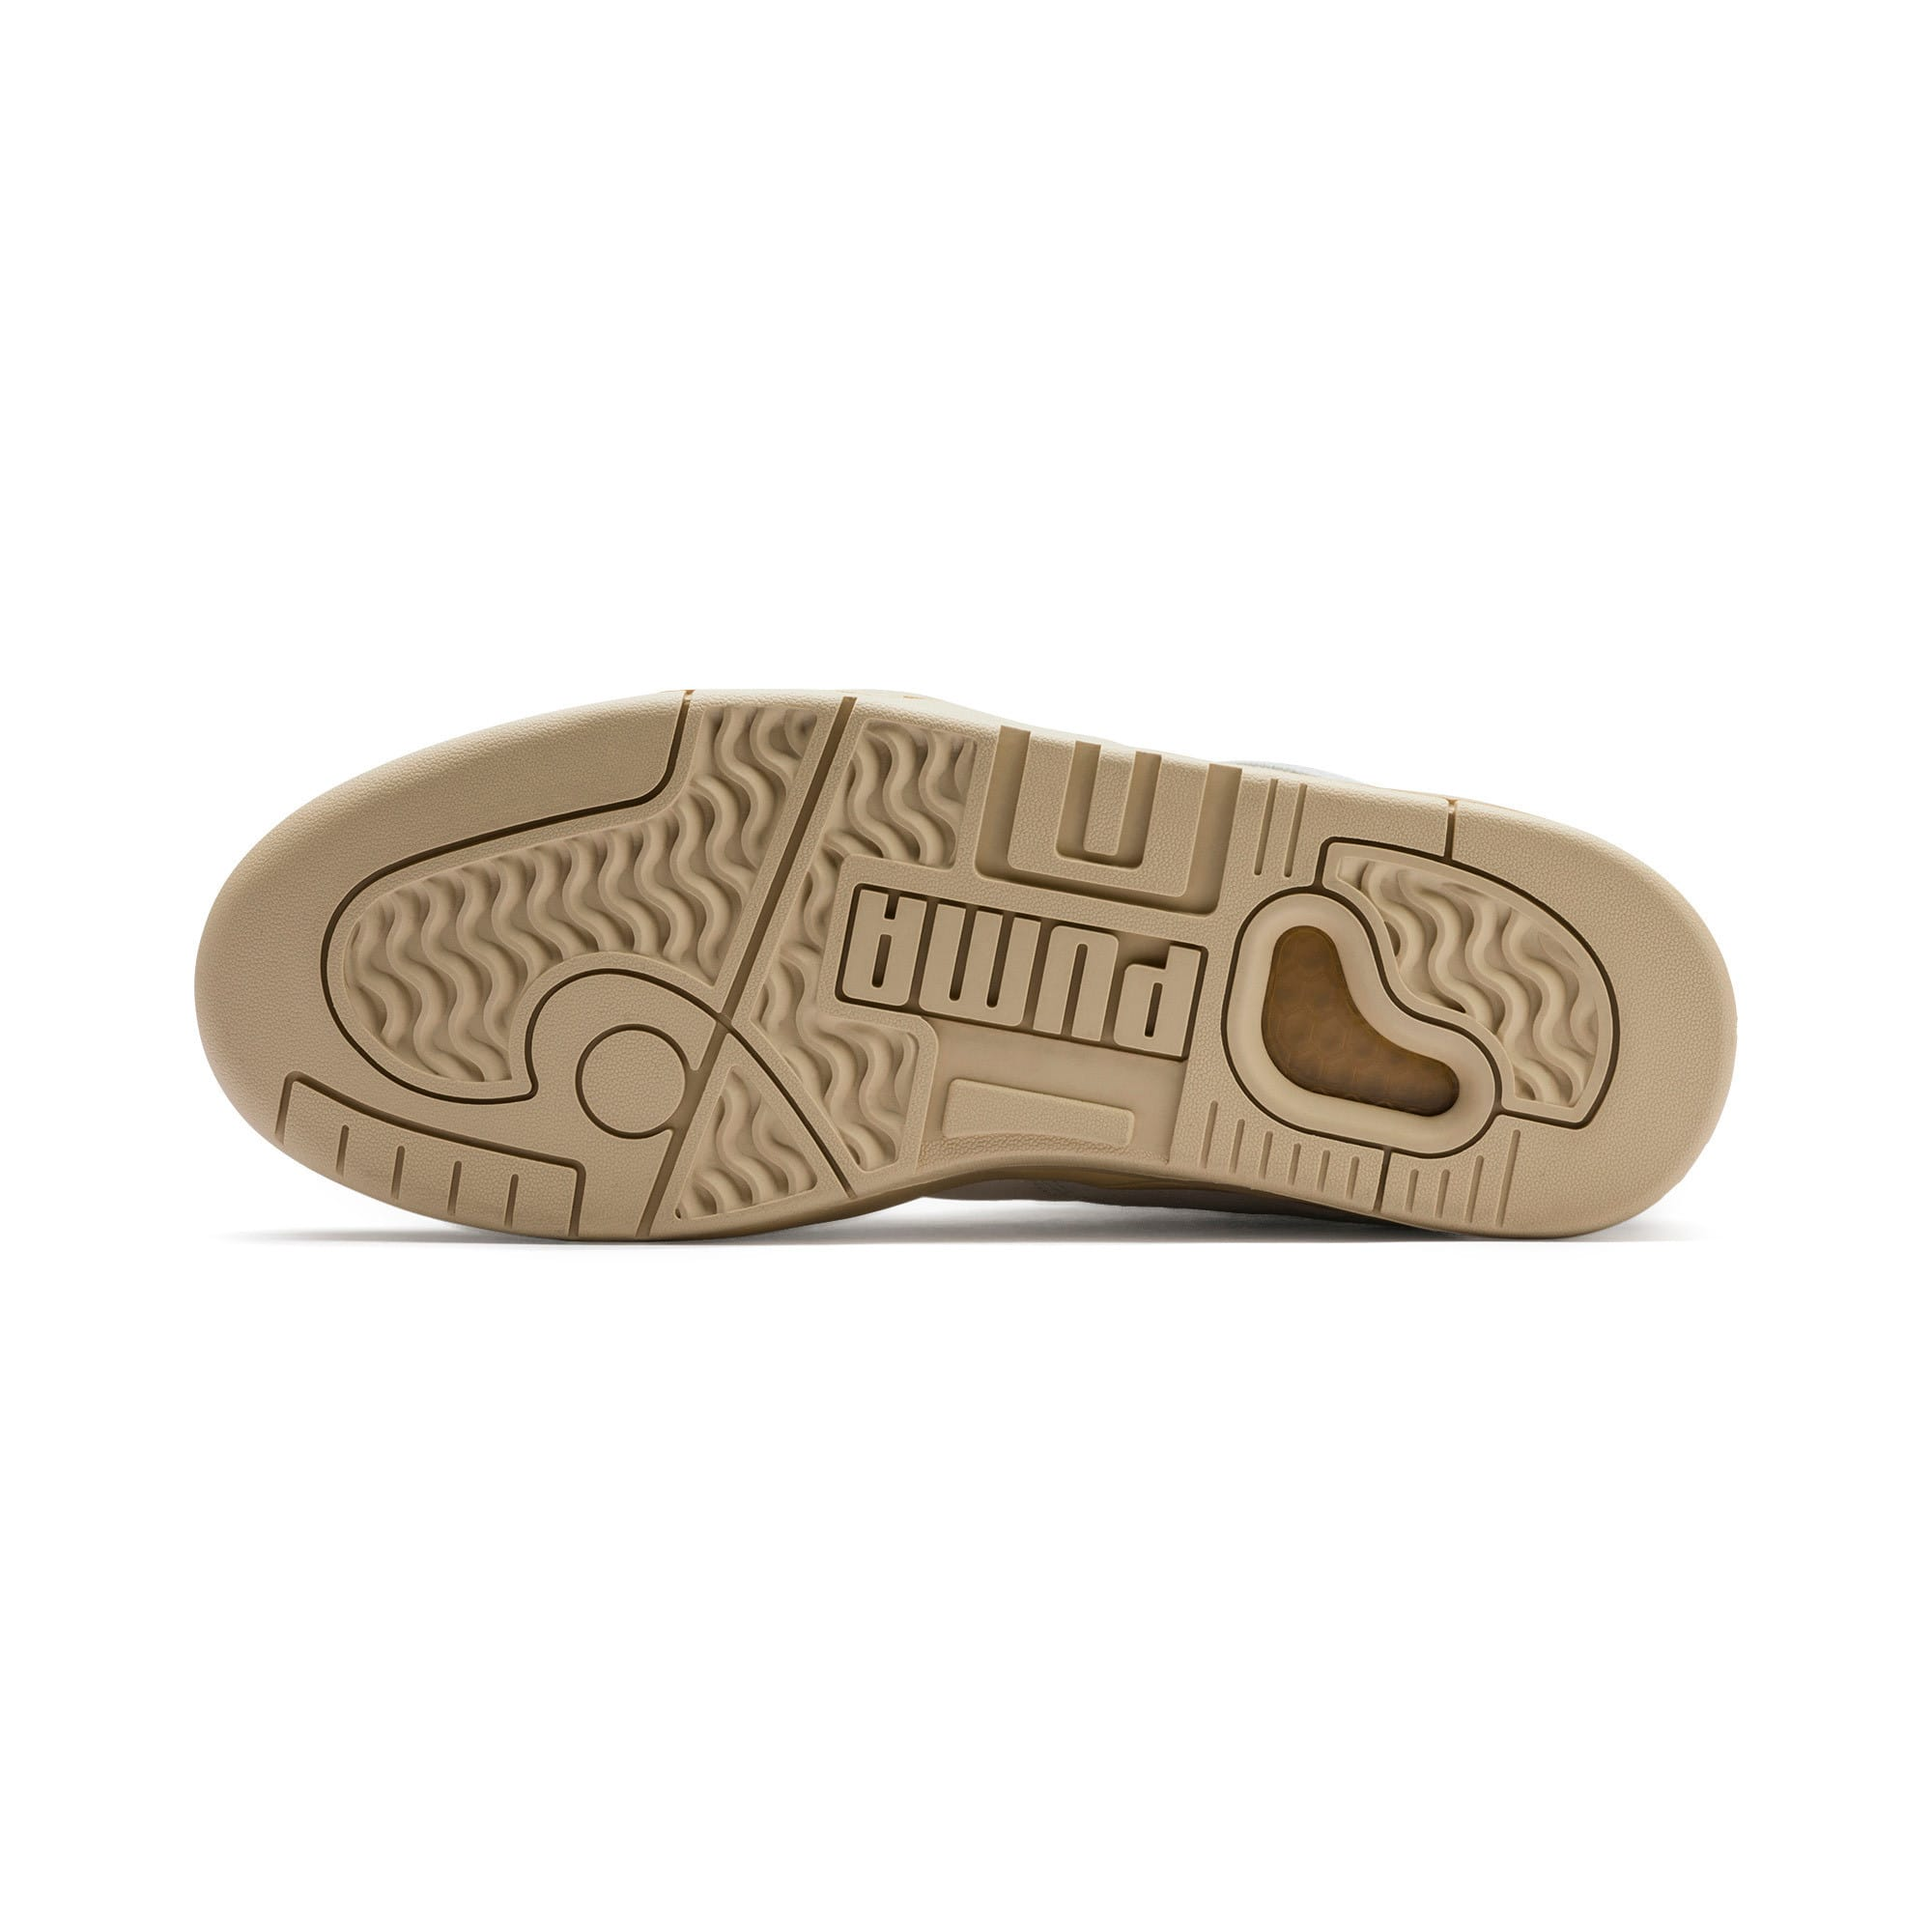 Thumbnail 4 of PUMA x RHUDE Palace Guard Sneakers, Star White-WINDCHIME, medium